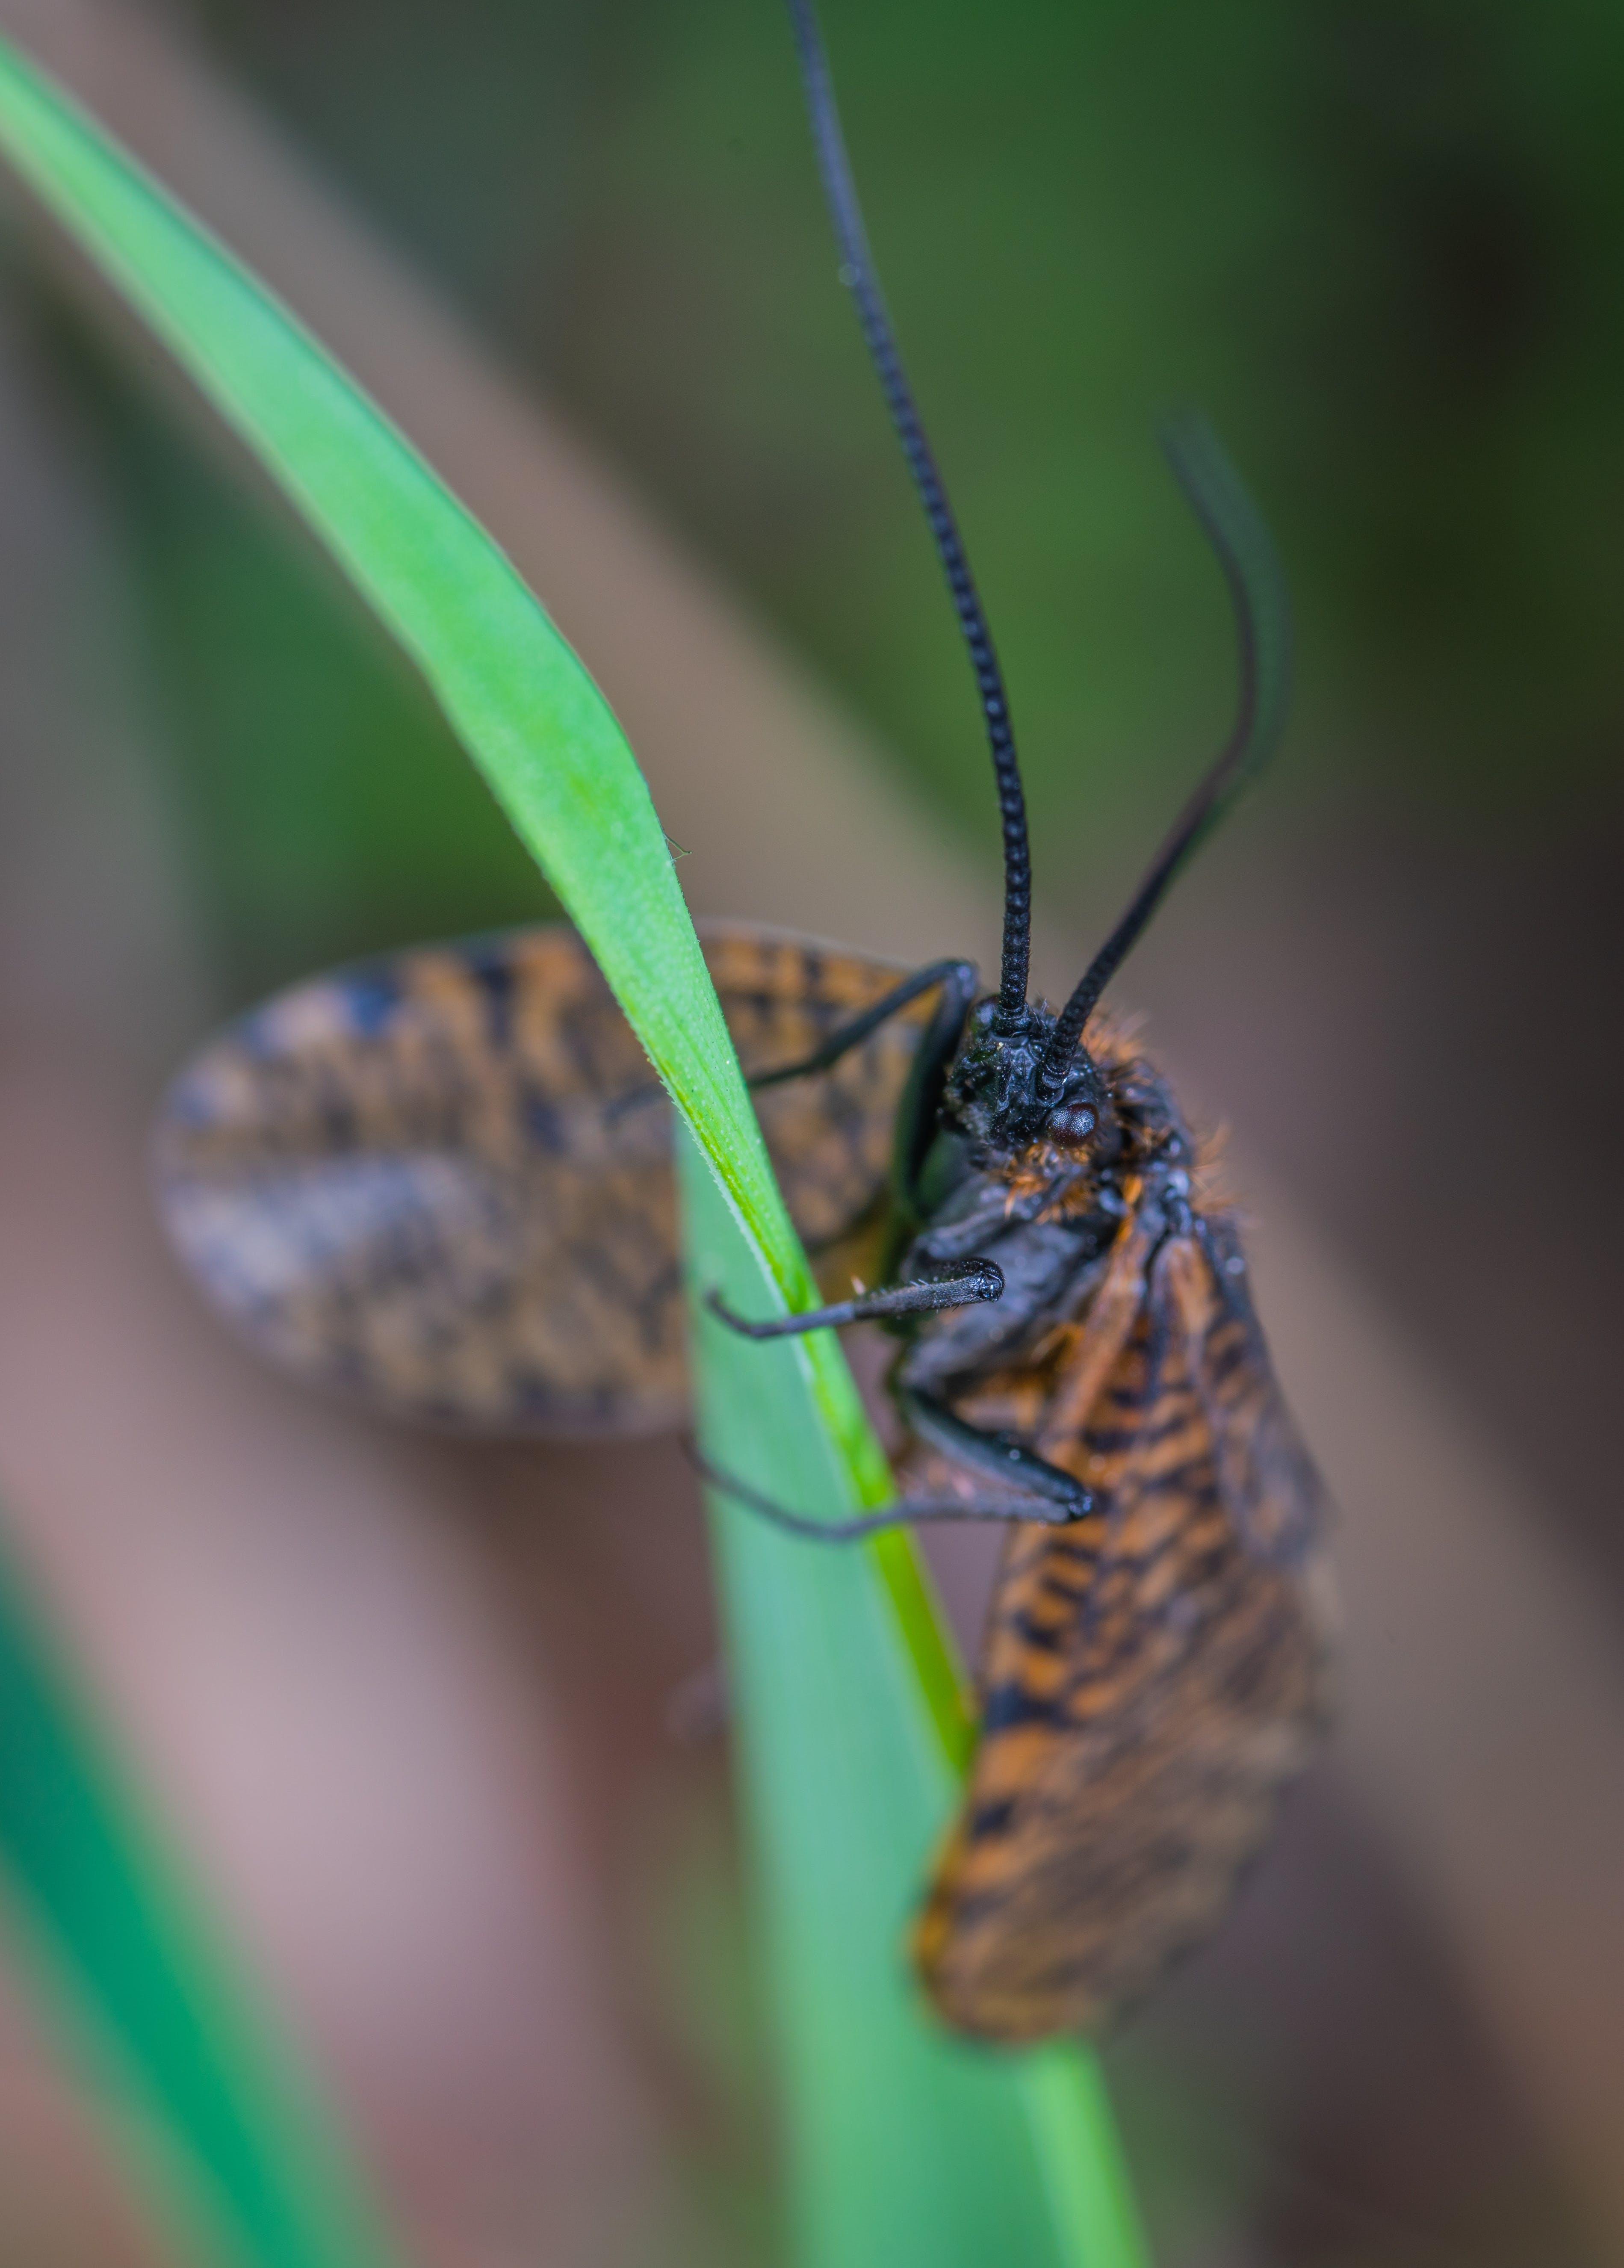 Gratis arkivbilde med dybdeskarphet, dyr, entomologi, farge